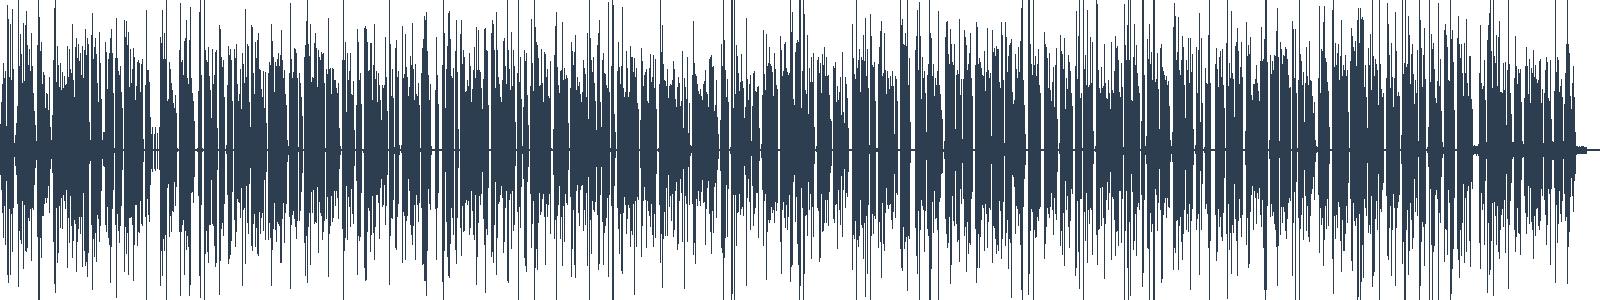 #citatelskydennik: Alfonz Bednár – Sklený vrch waveform